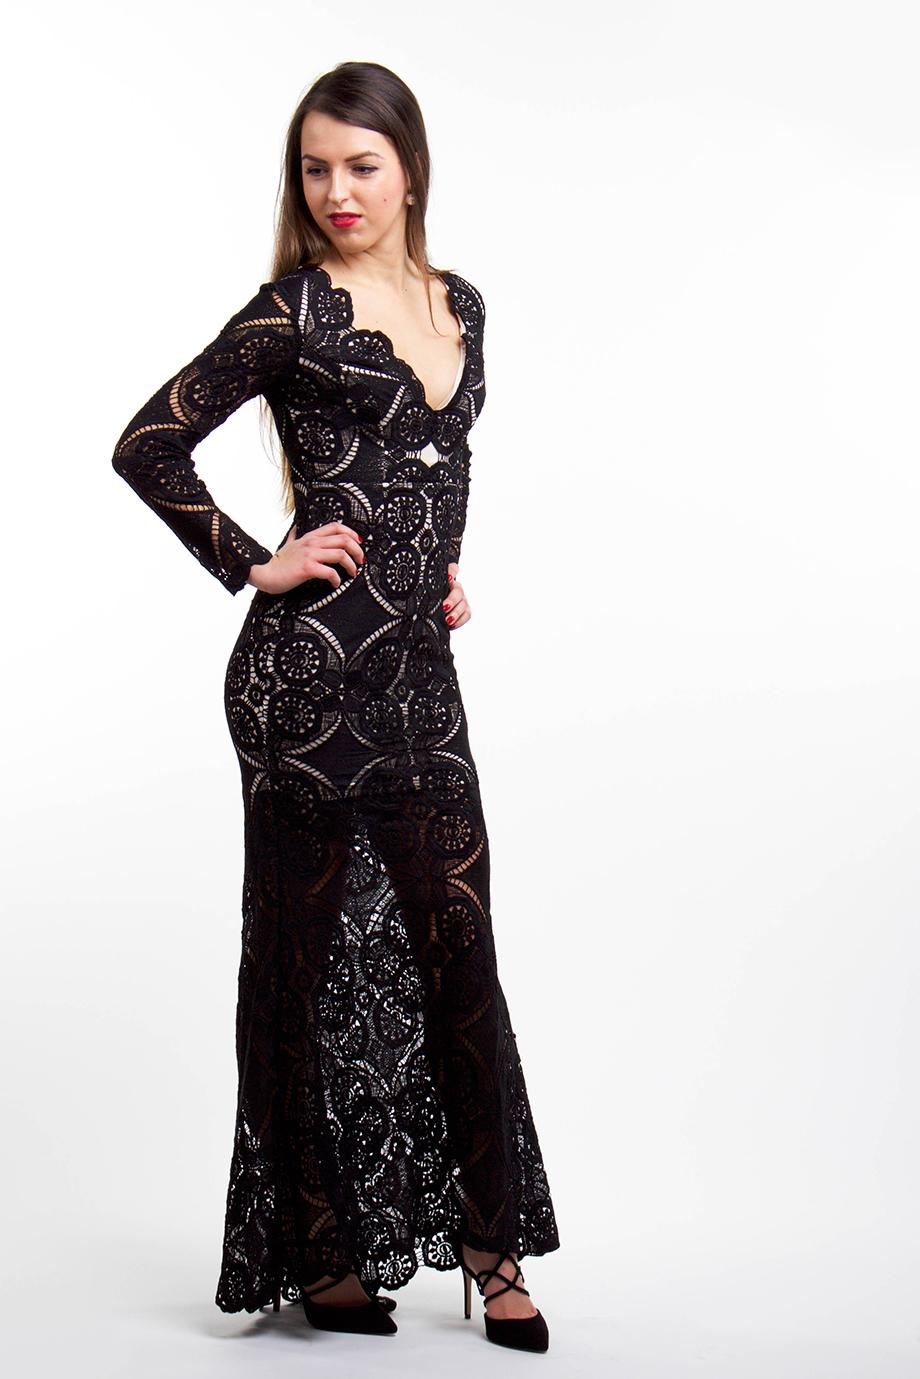 e8c1d8fe8442 obrázok 1 Čierne dlhé čipkované šaty